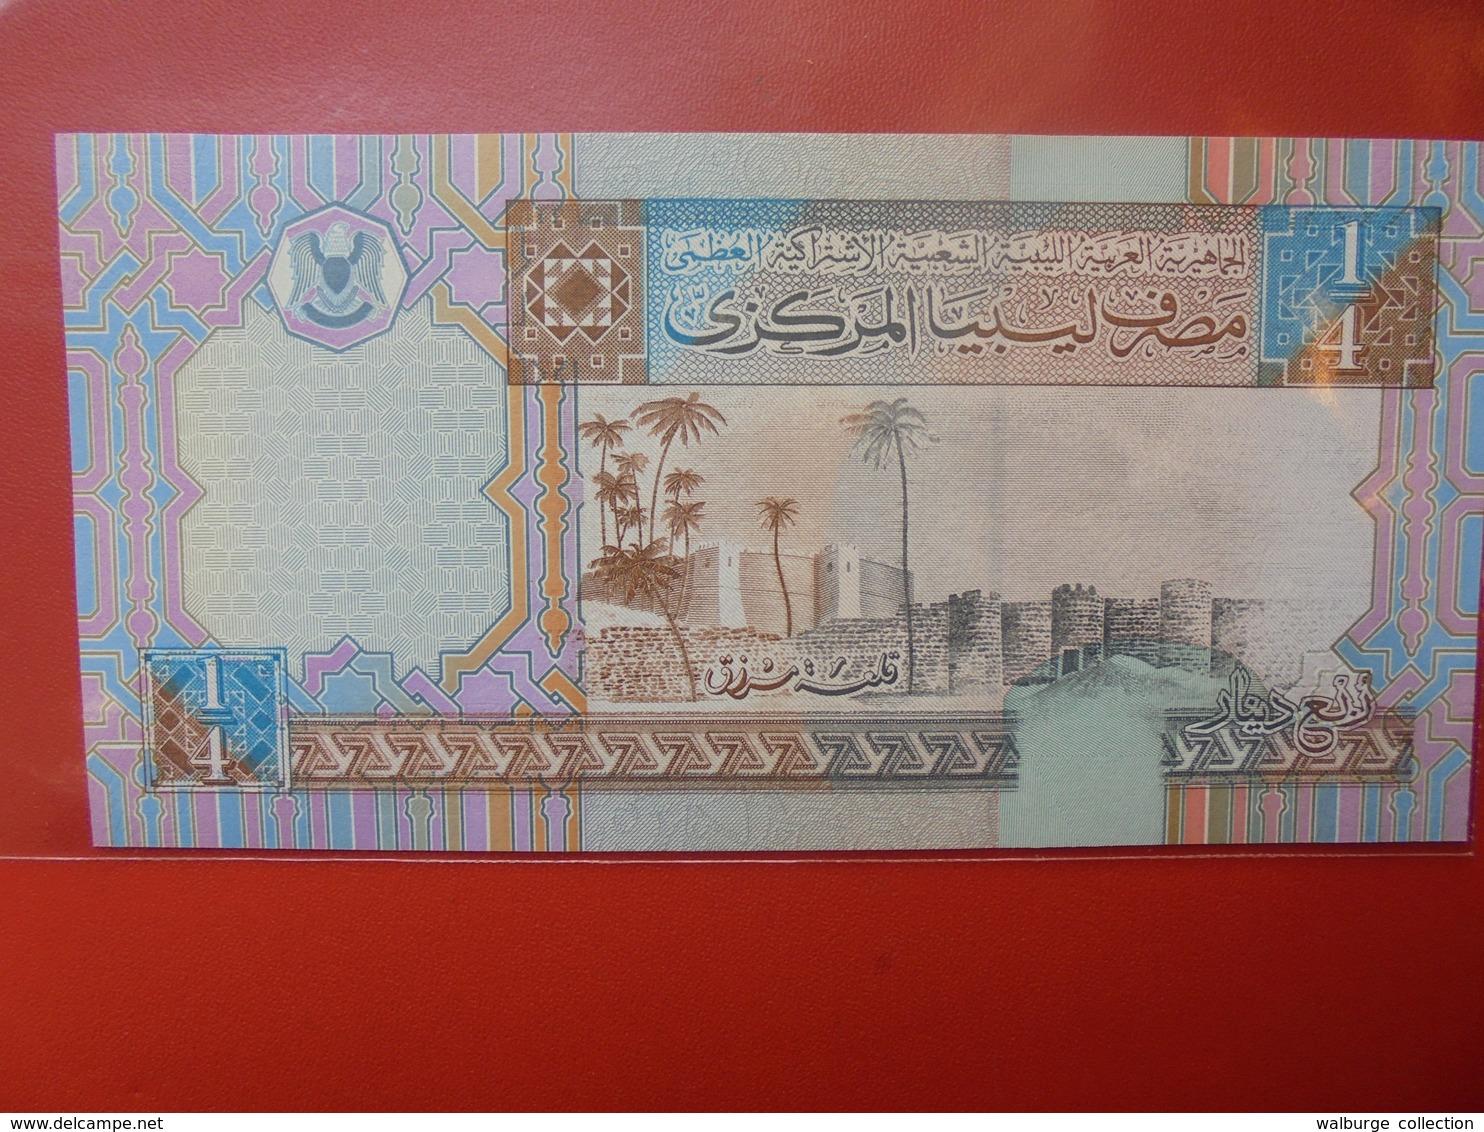 LIBYE 1/4 DINAR 2002 PEU CIRCULER/NEUF - Libya